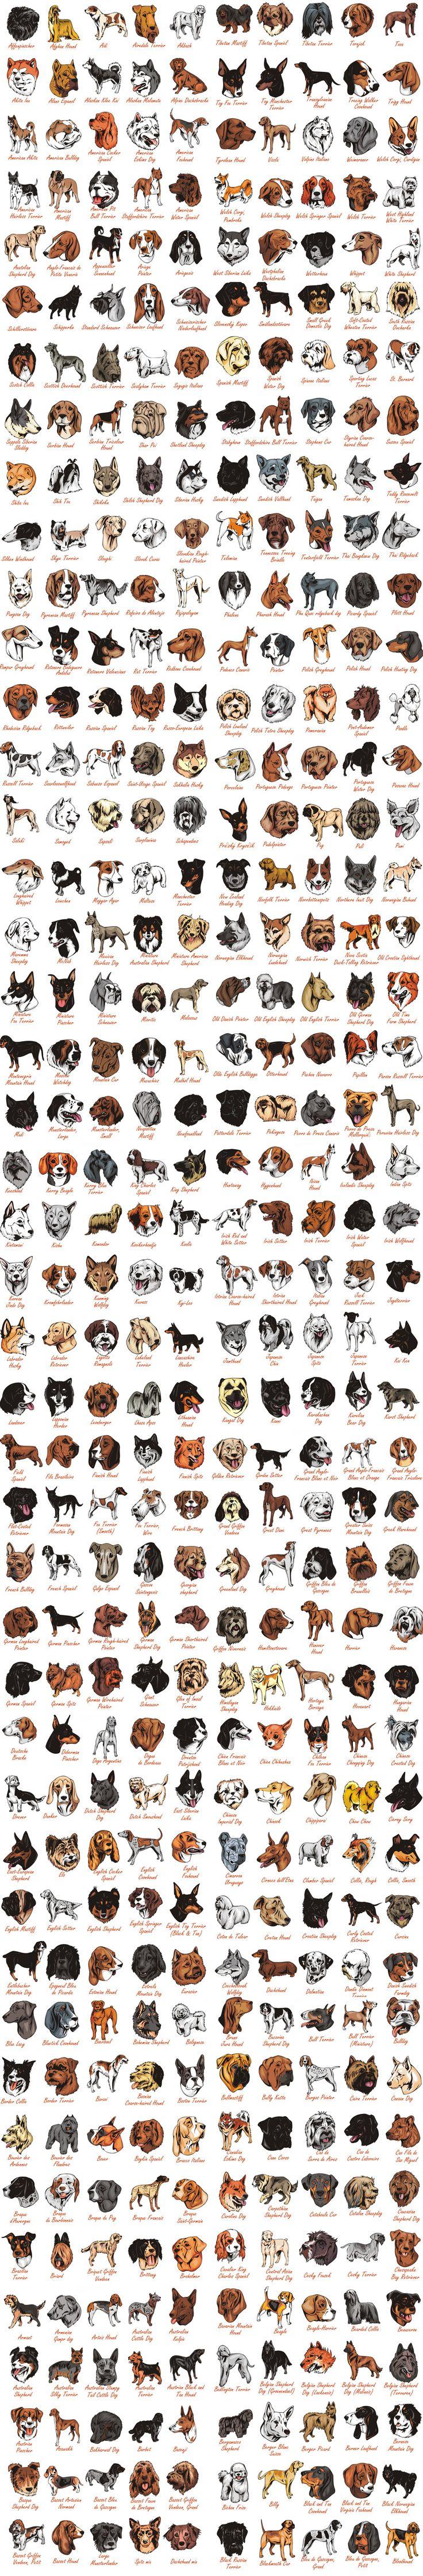 All dog breeds - Download  a set of 1350+ Dog breeds in vector format